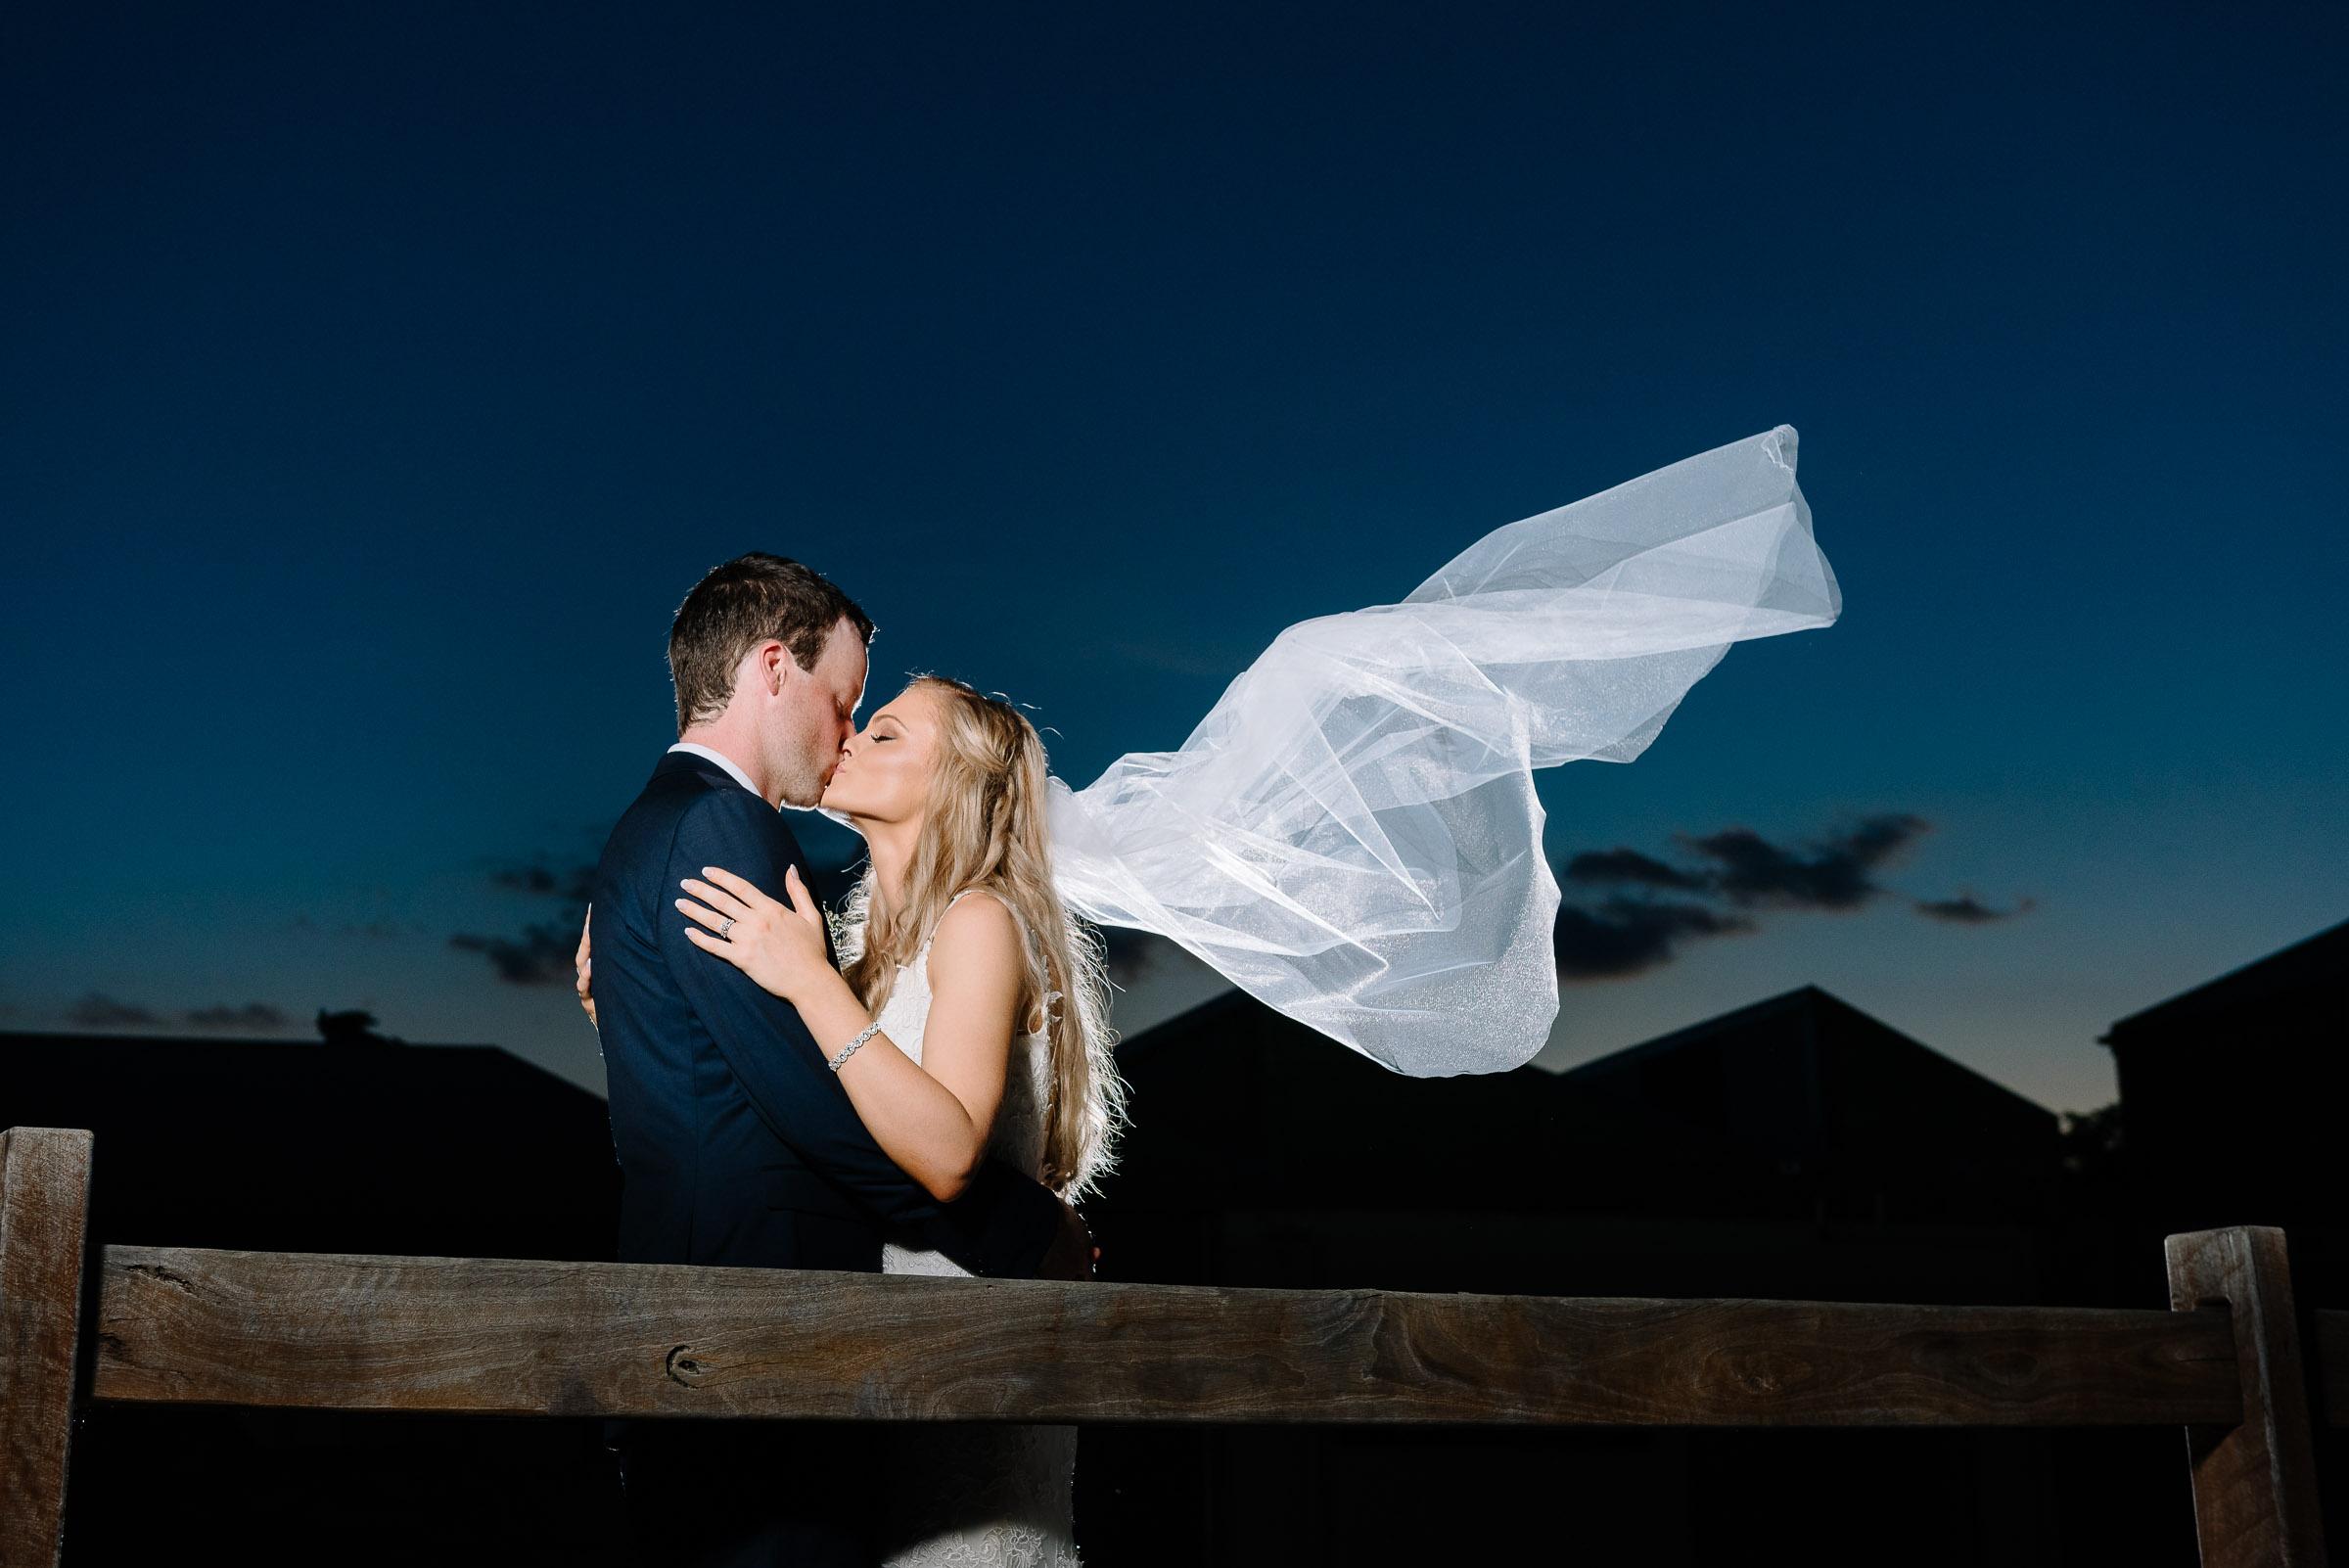 Sunset Flying Veil at Historic Port of Echuca - Radcliffes Wedding Photographer Echuca